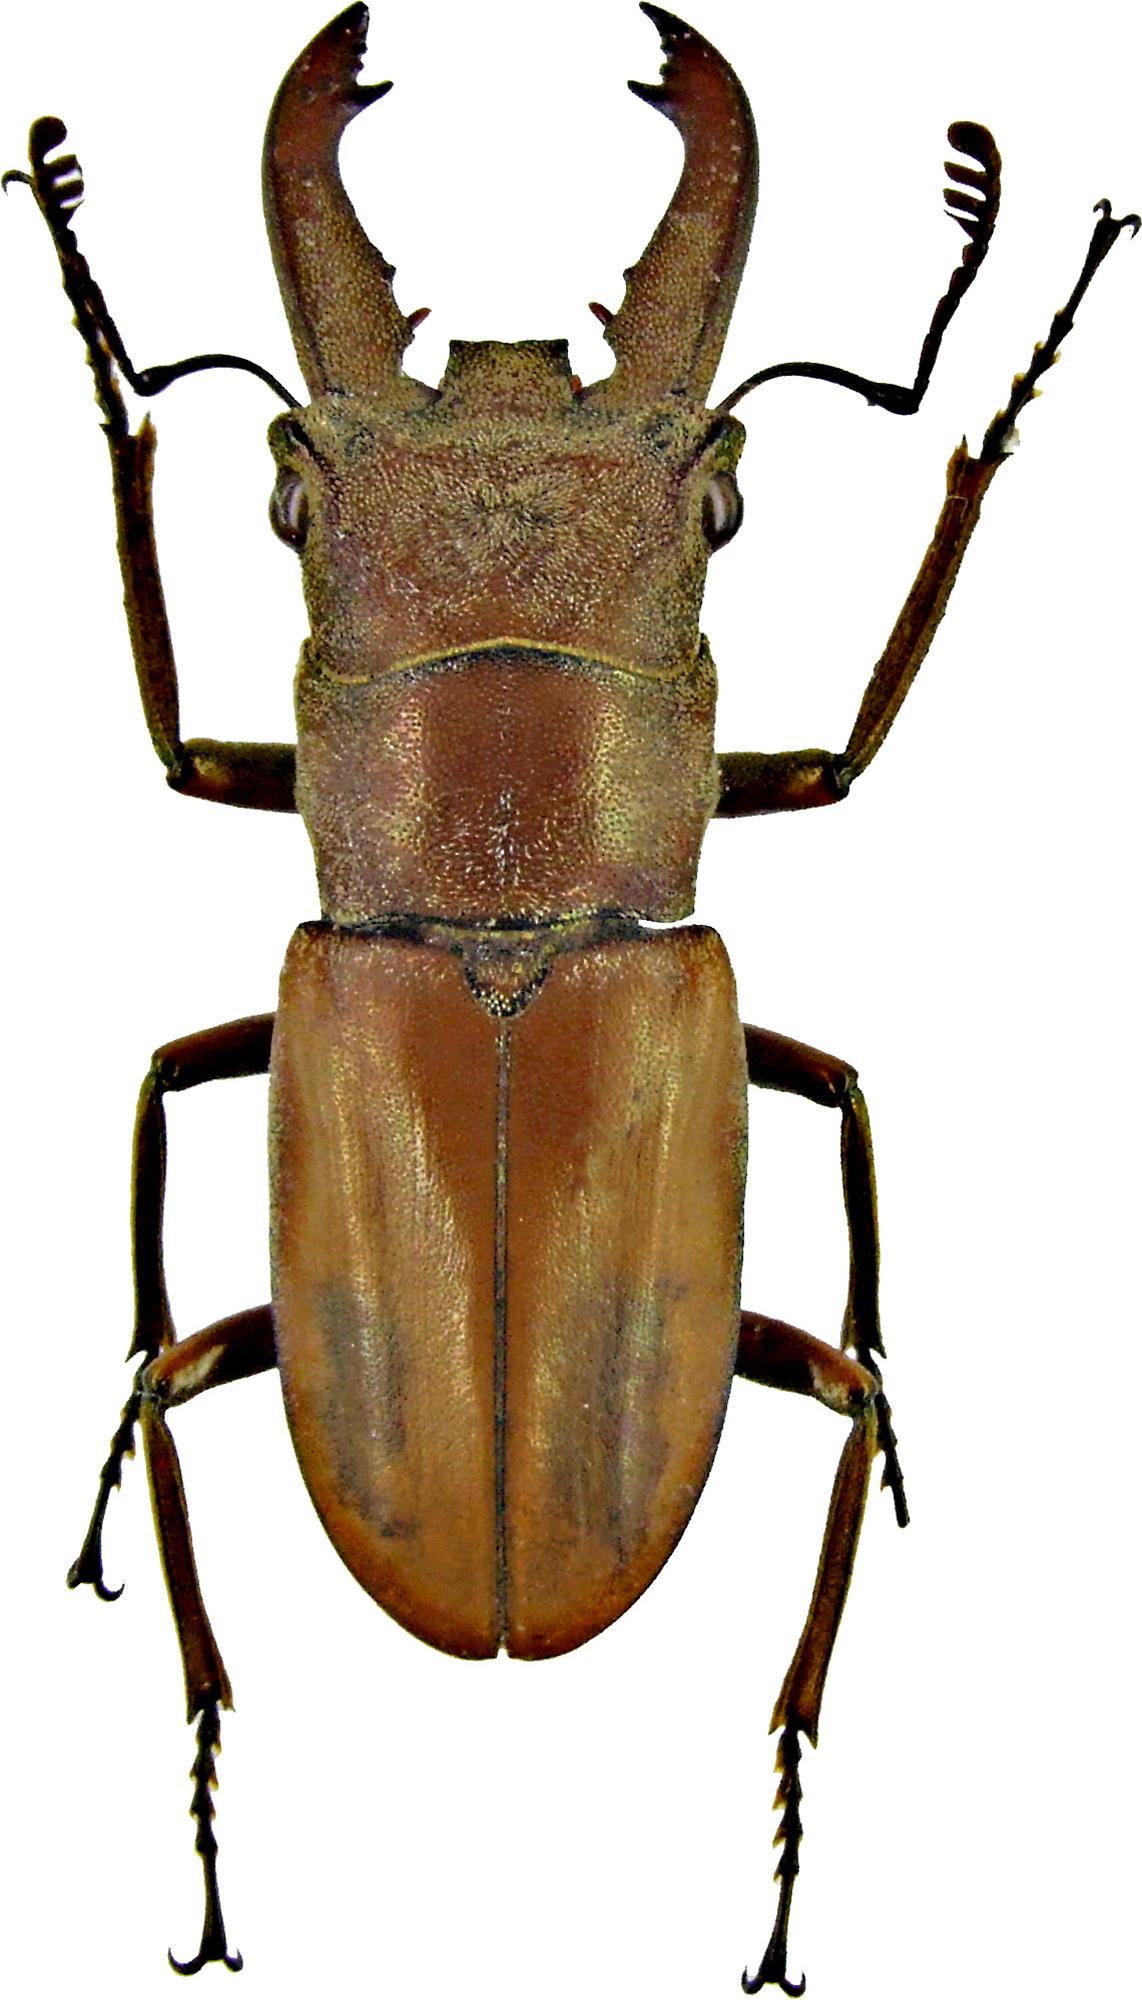 Cyclommatus lunifer 1224.jpg